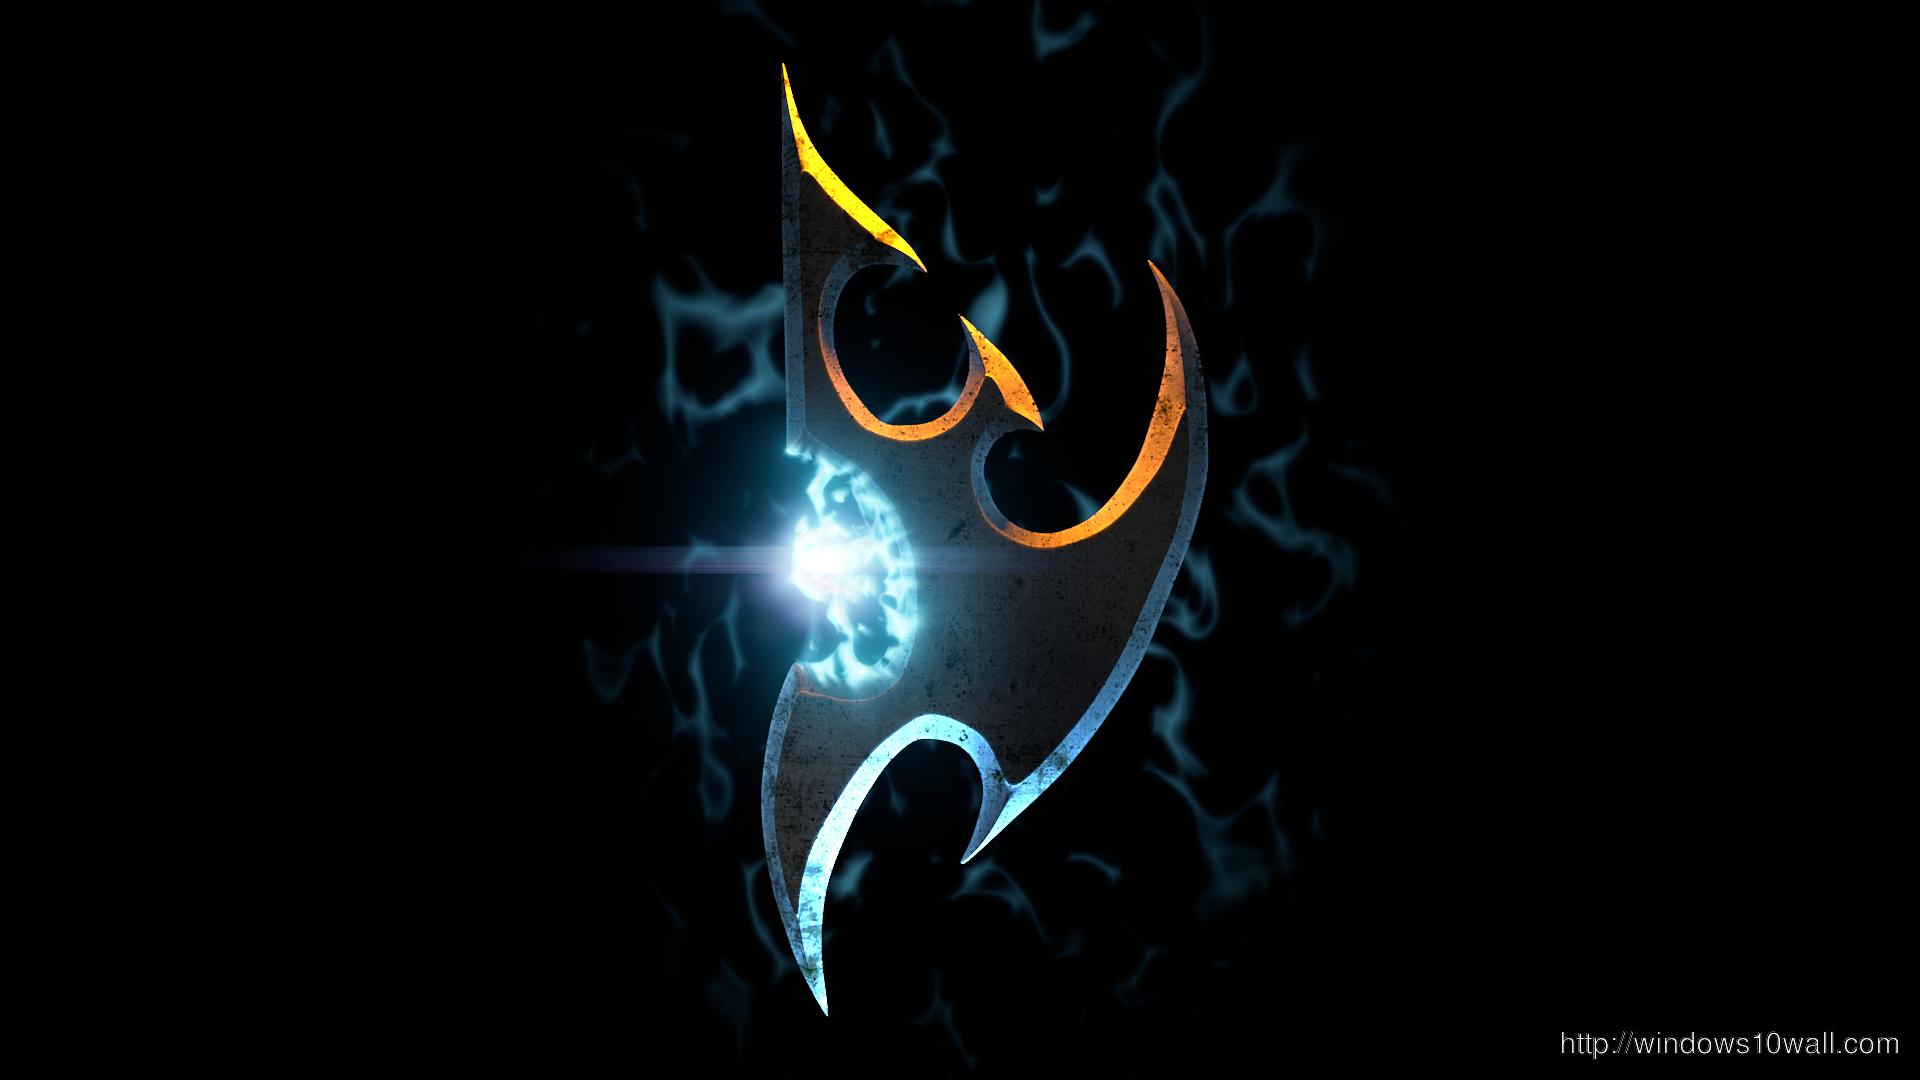 Download StarCraft Wallpaper - windows 10 Wallpapers